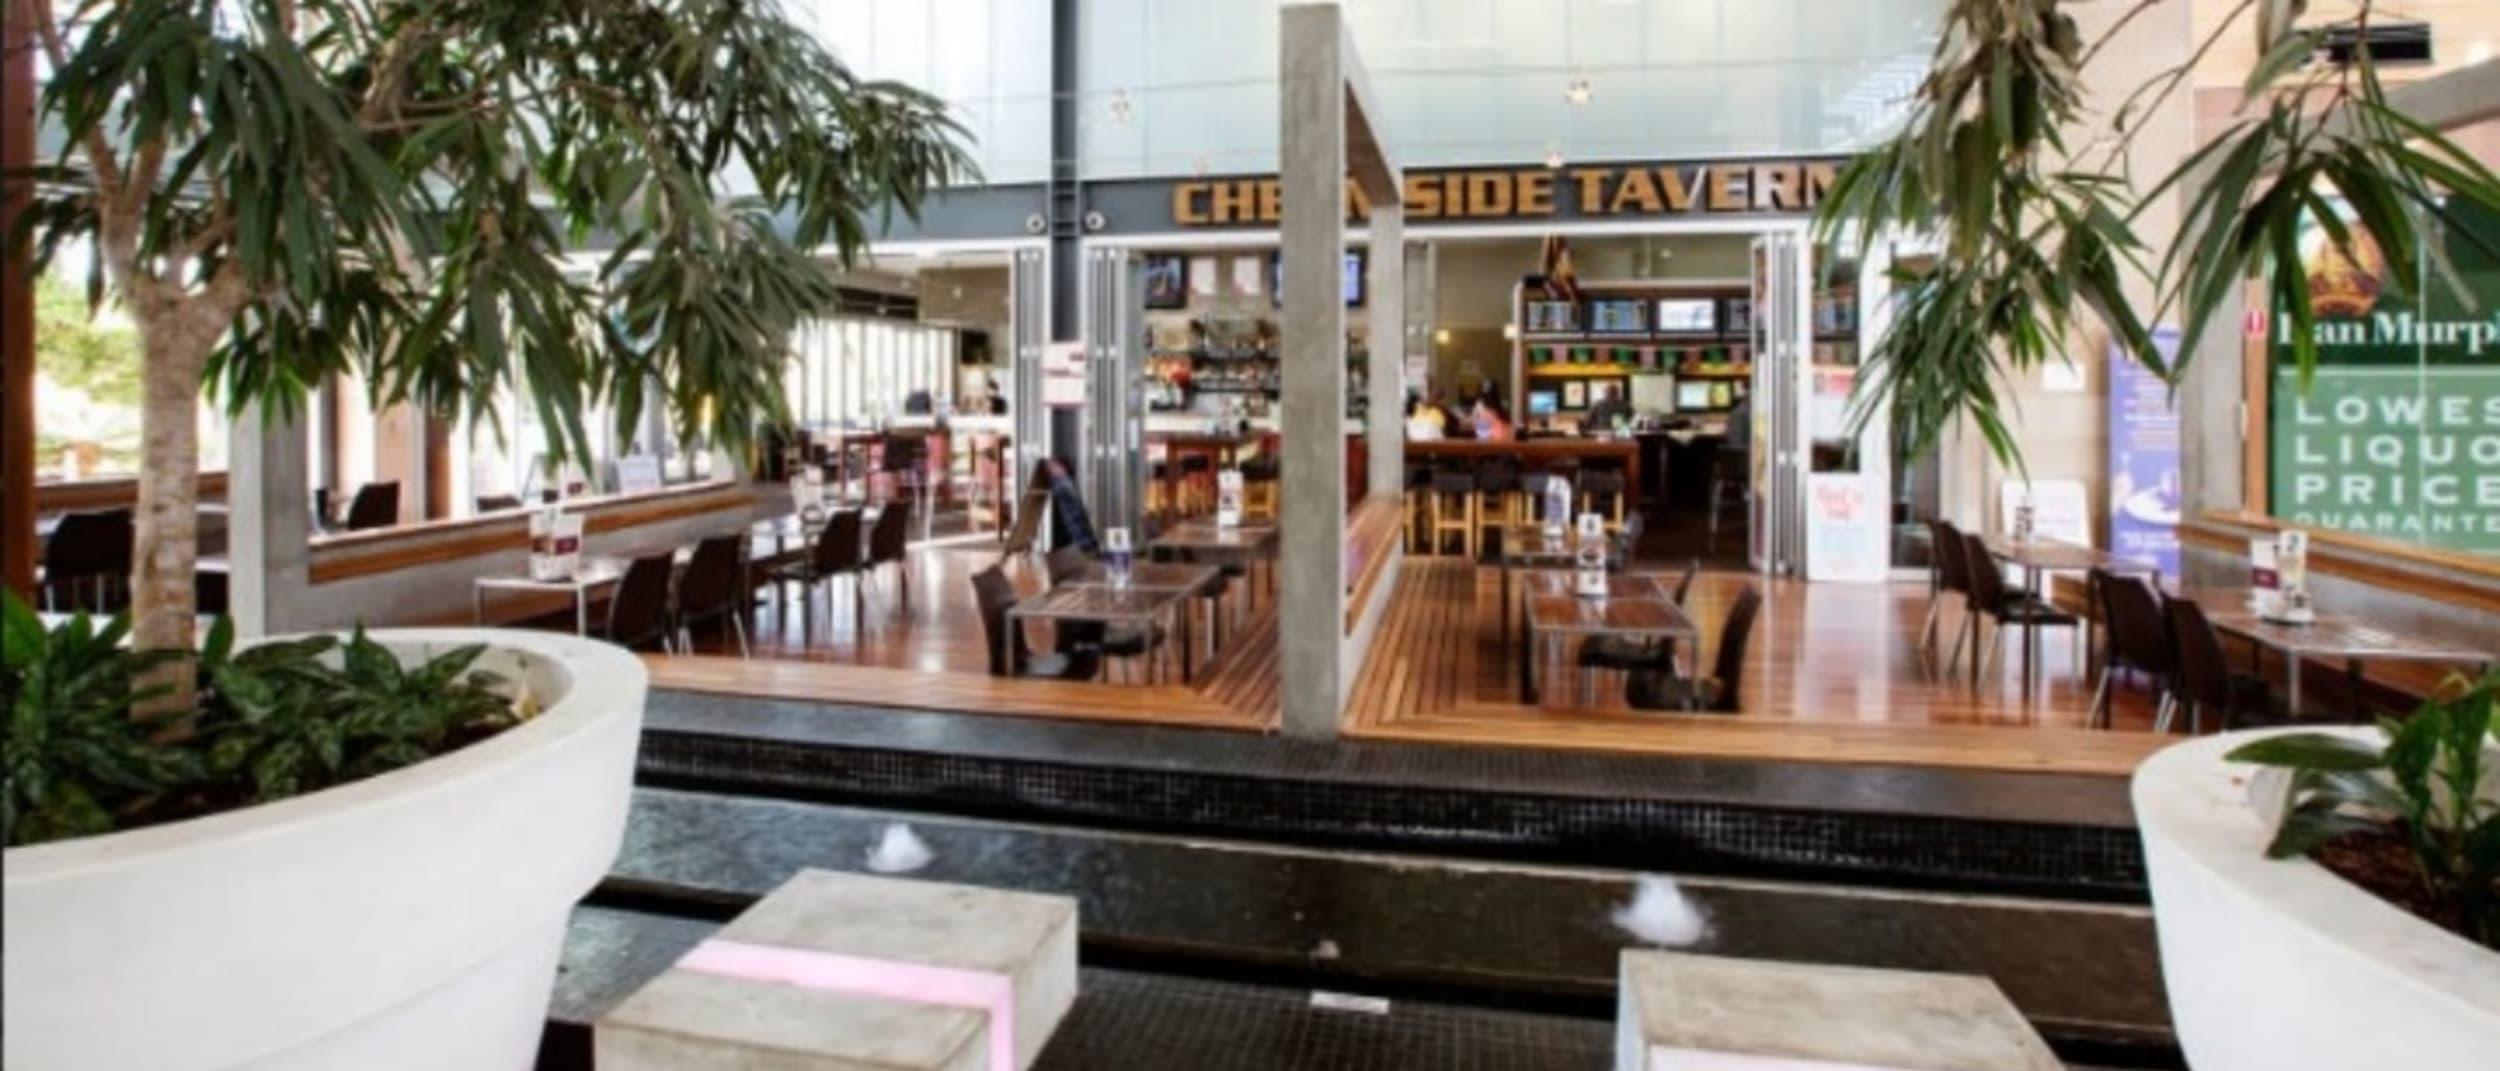 Chermside Tavern: Trivia Wednesday